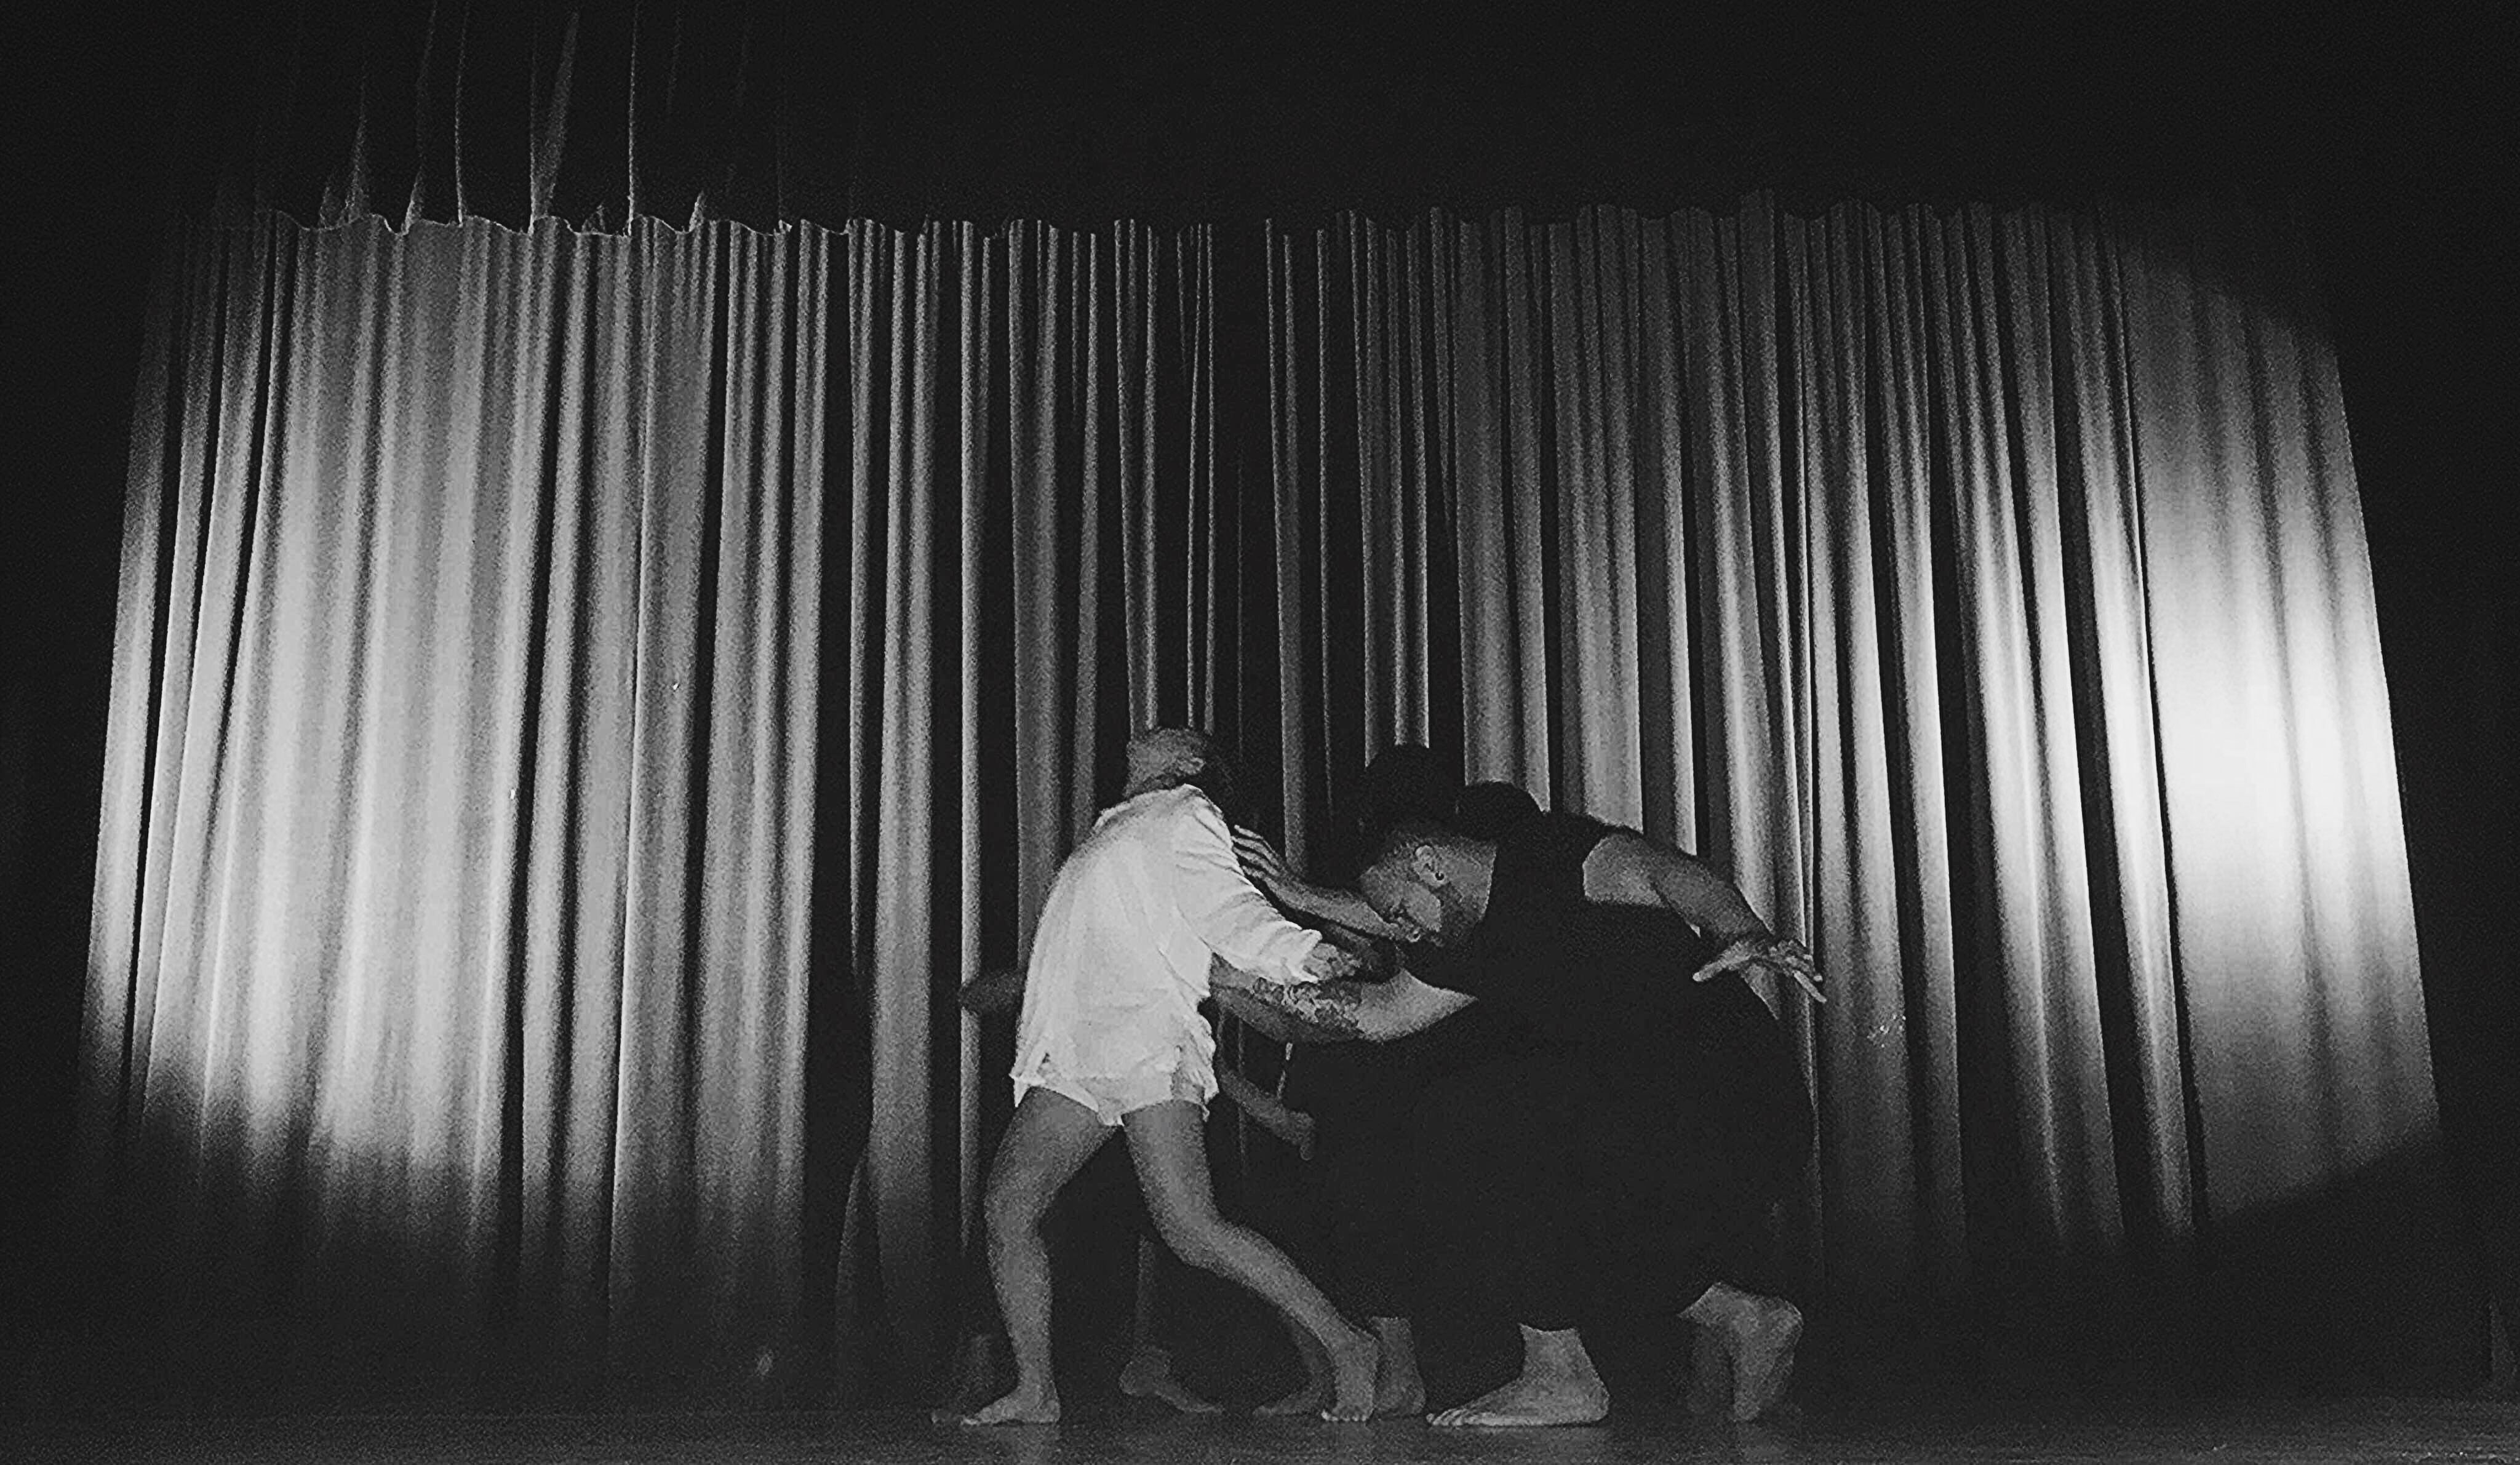 Dance Aotearoa New Zealand Taking Dance To The People – Anton Pulefale / MMØS